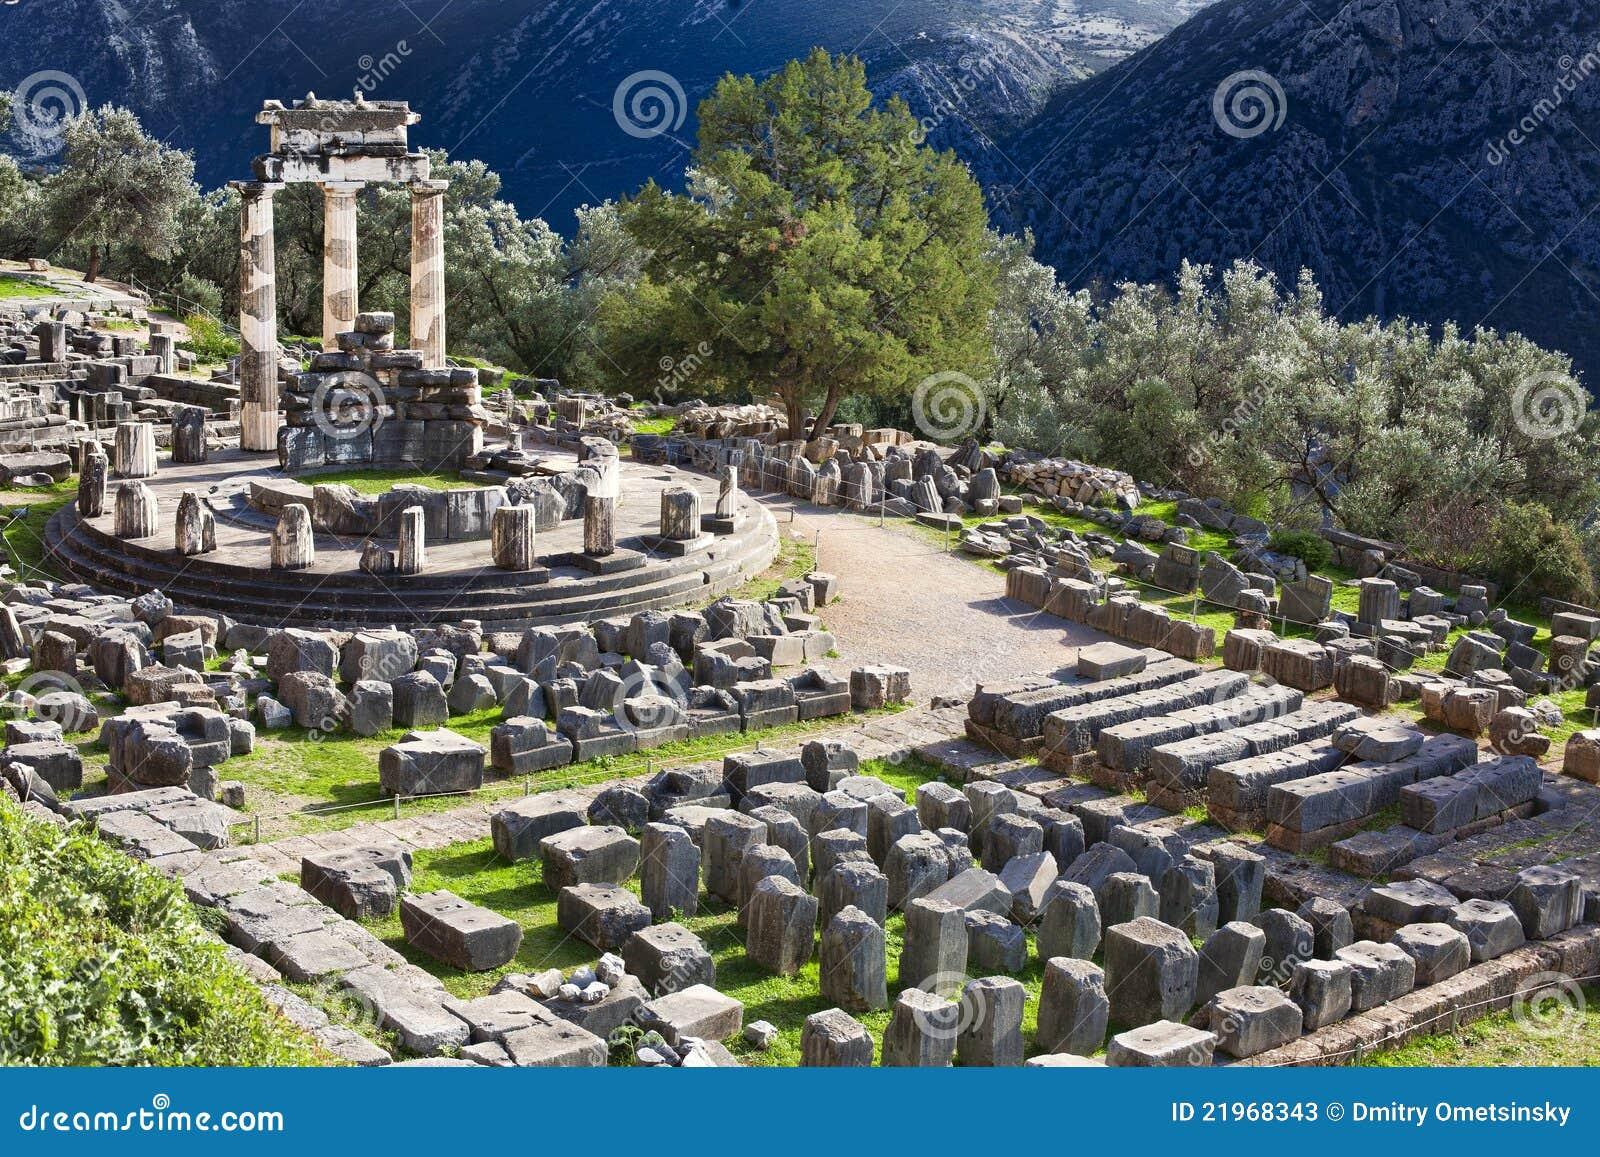 Delphi Greece  city photos gallery : ... of Ancient Greek temple of Athena on Mount Parnas in Delphi, Greece